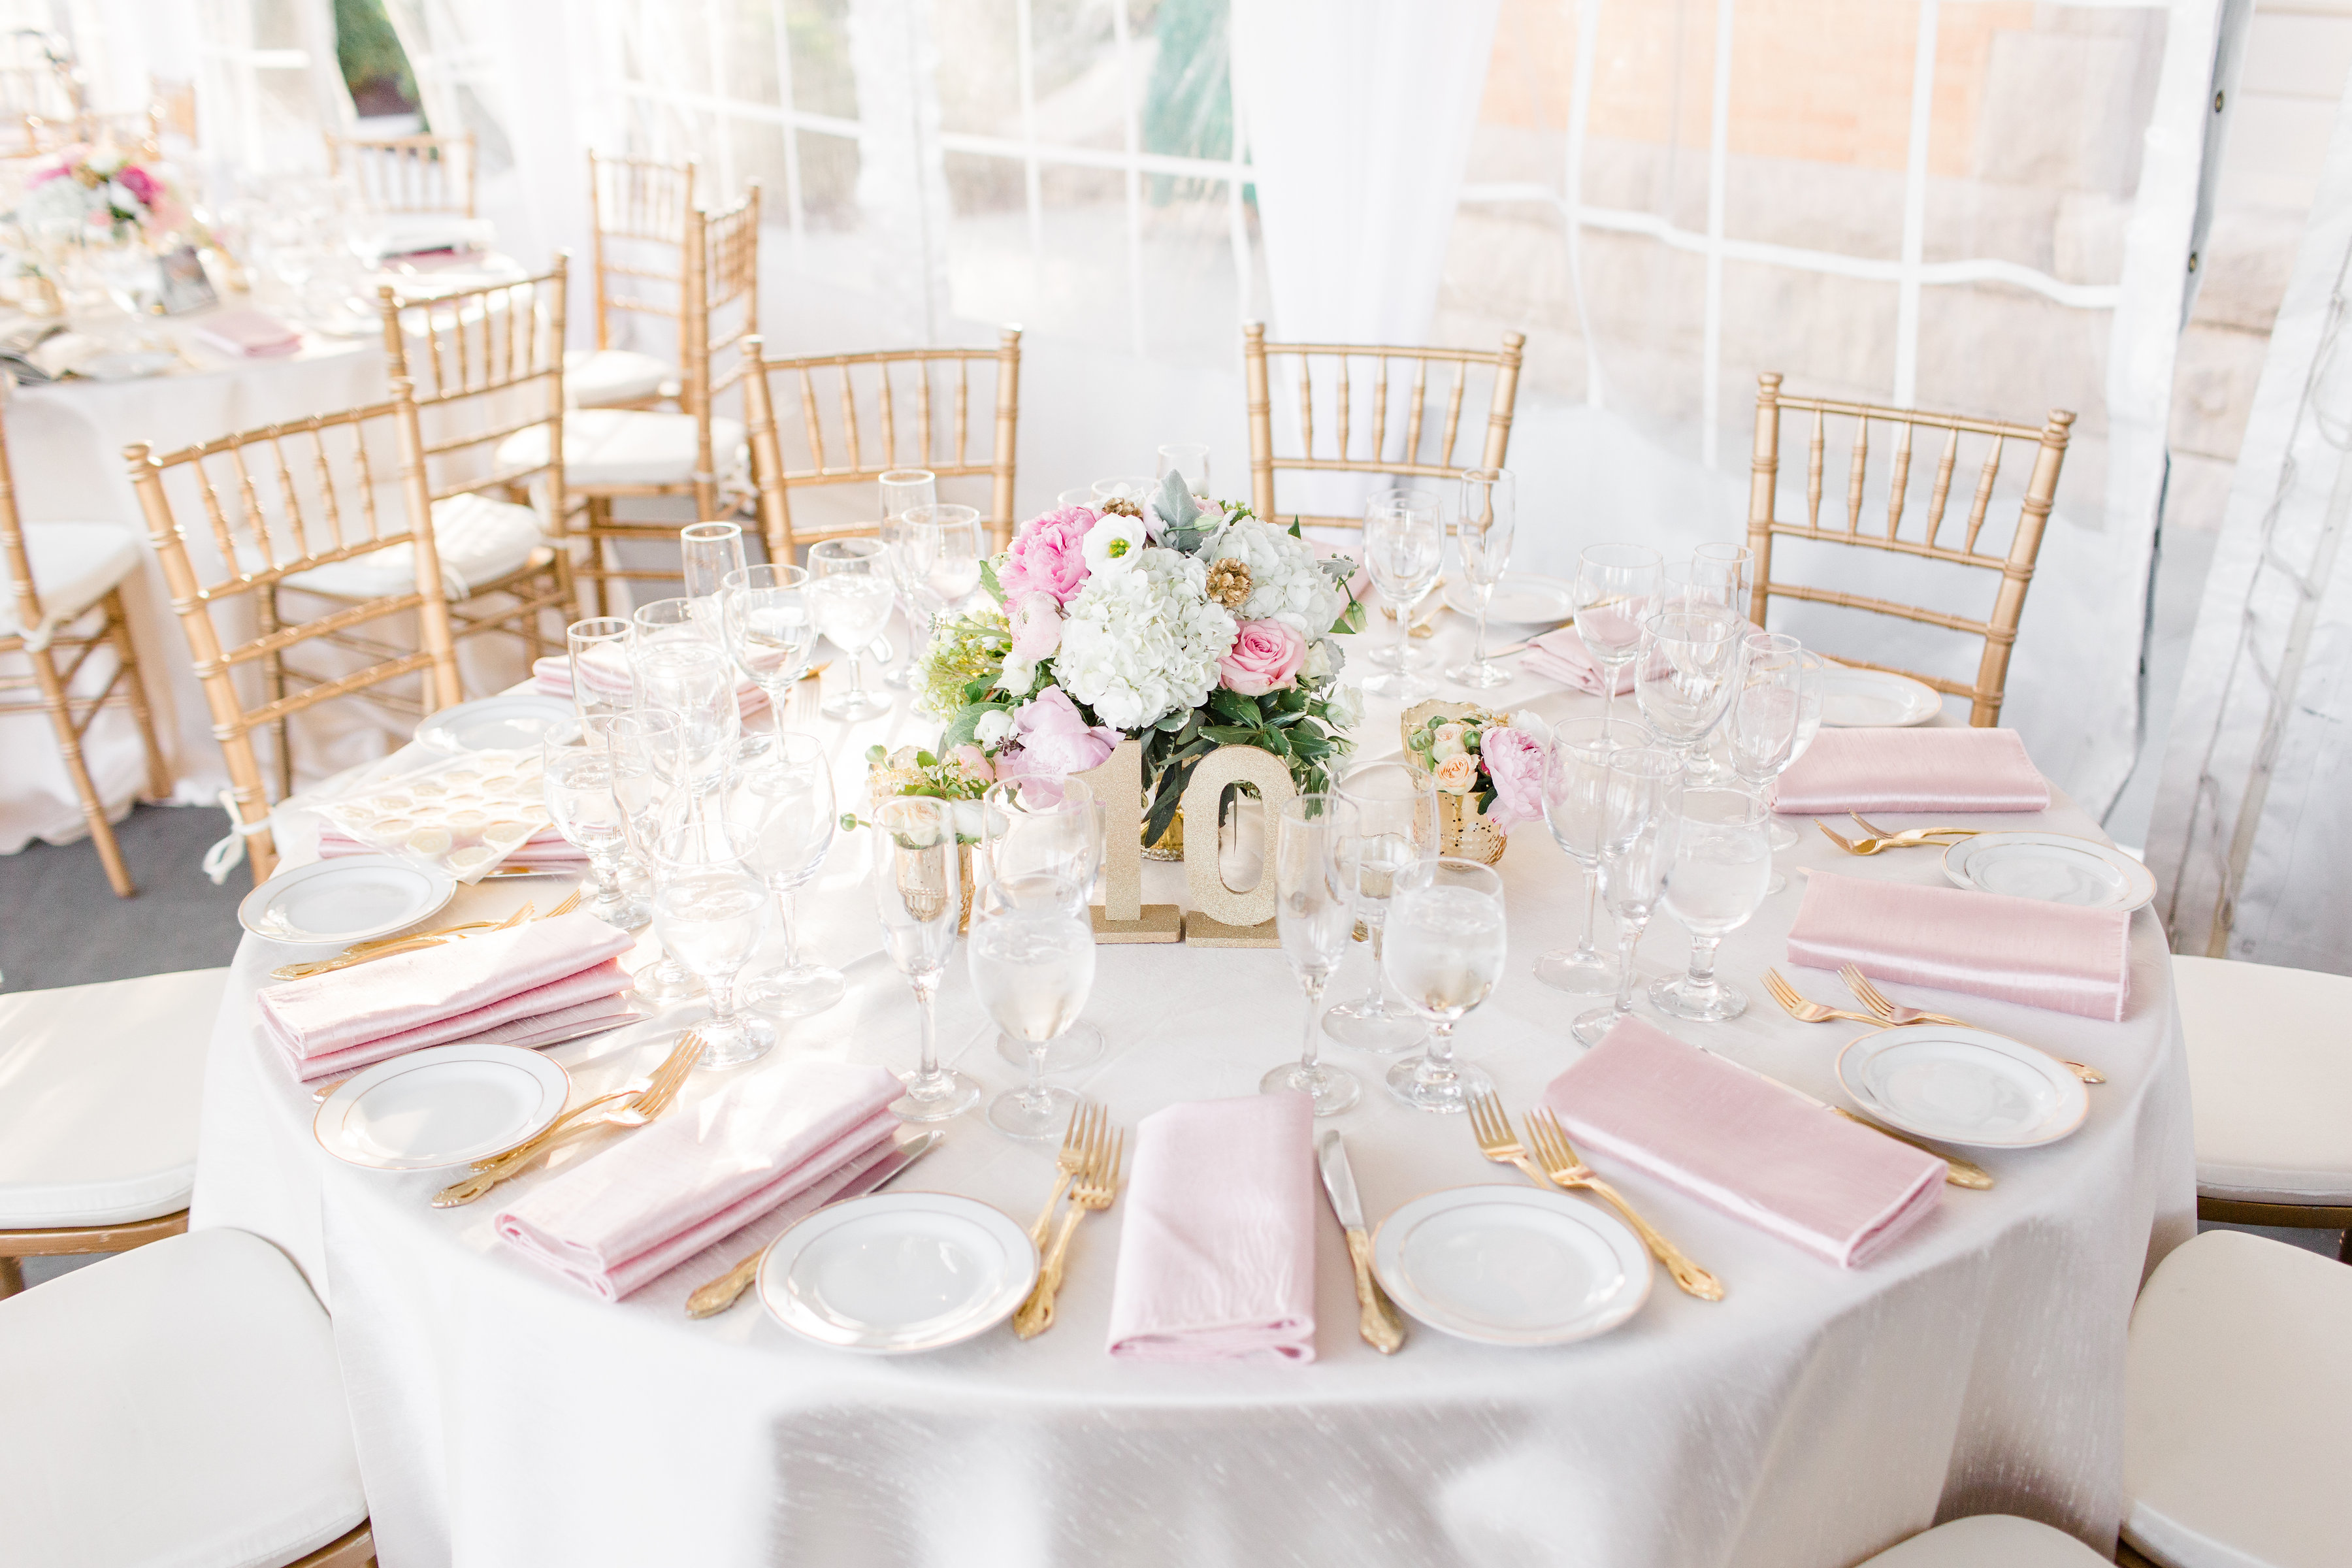 lauren_fair_photography_april_lynn_designs_stasia_matt_spring_cairnwood_estate_wedding_northeast_philadelphia_blush_pink_gold_wedding_invitation_stationery_0147